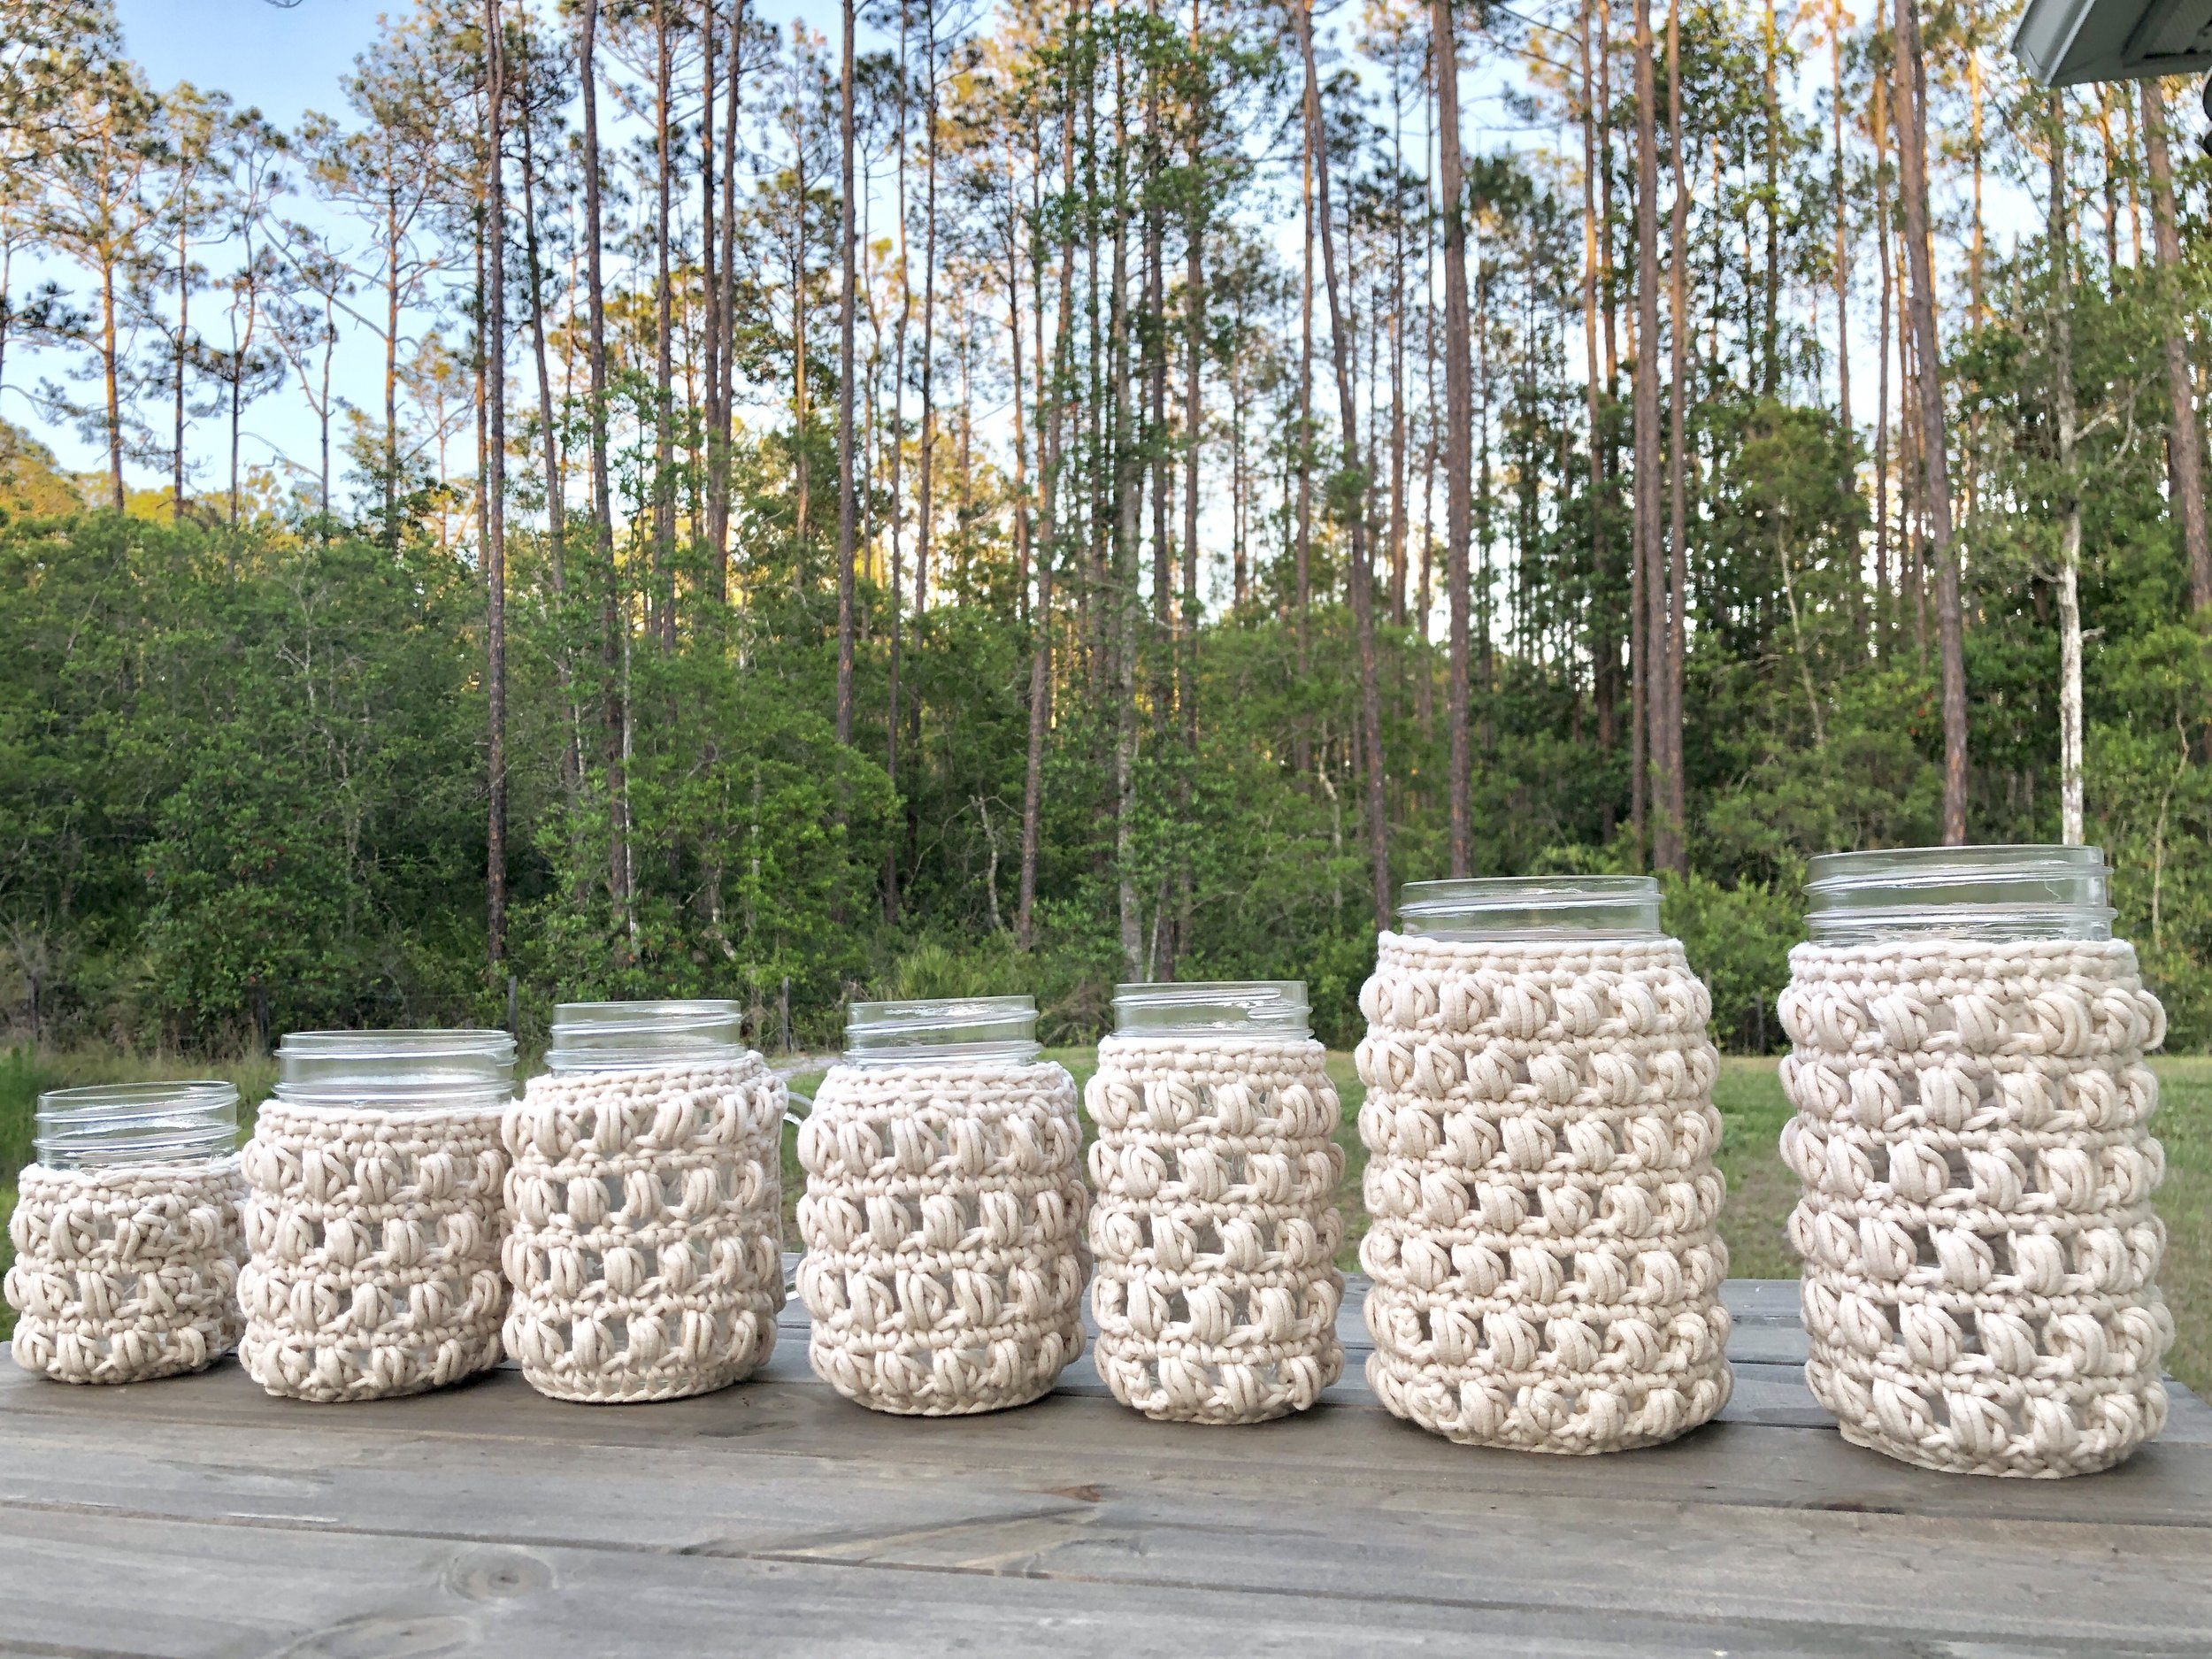 White Bluffs Mason Jar Cozy - Crochet Pattern - The Roving Nomad